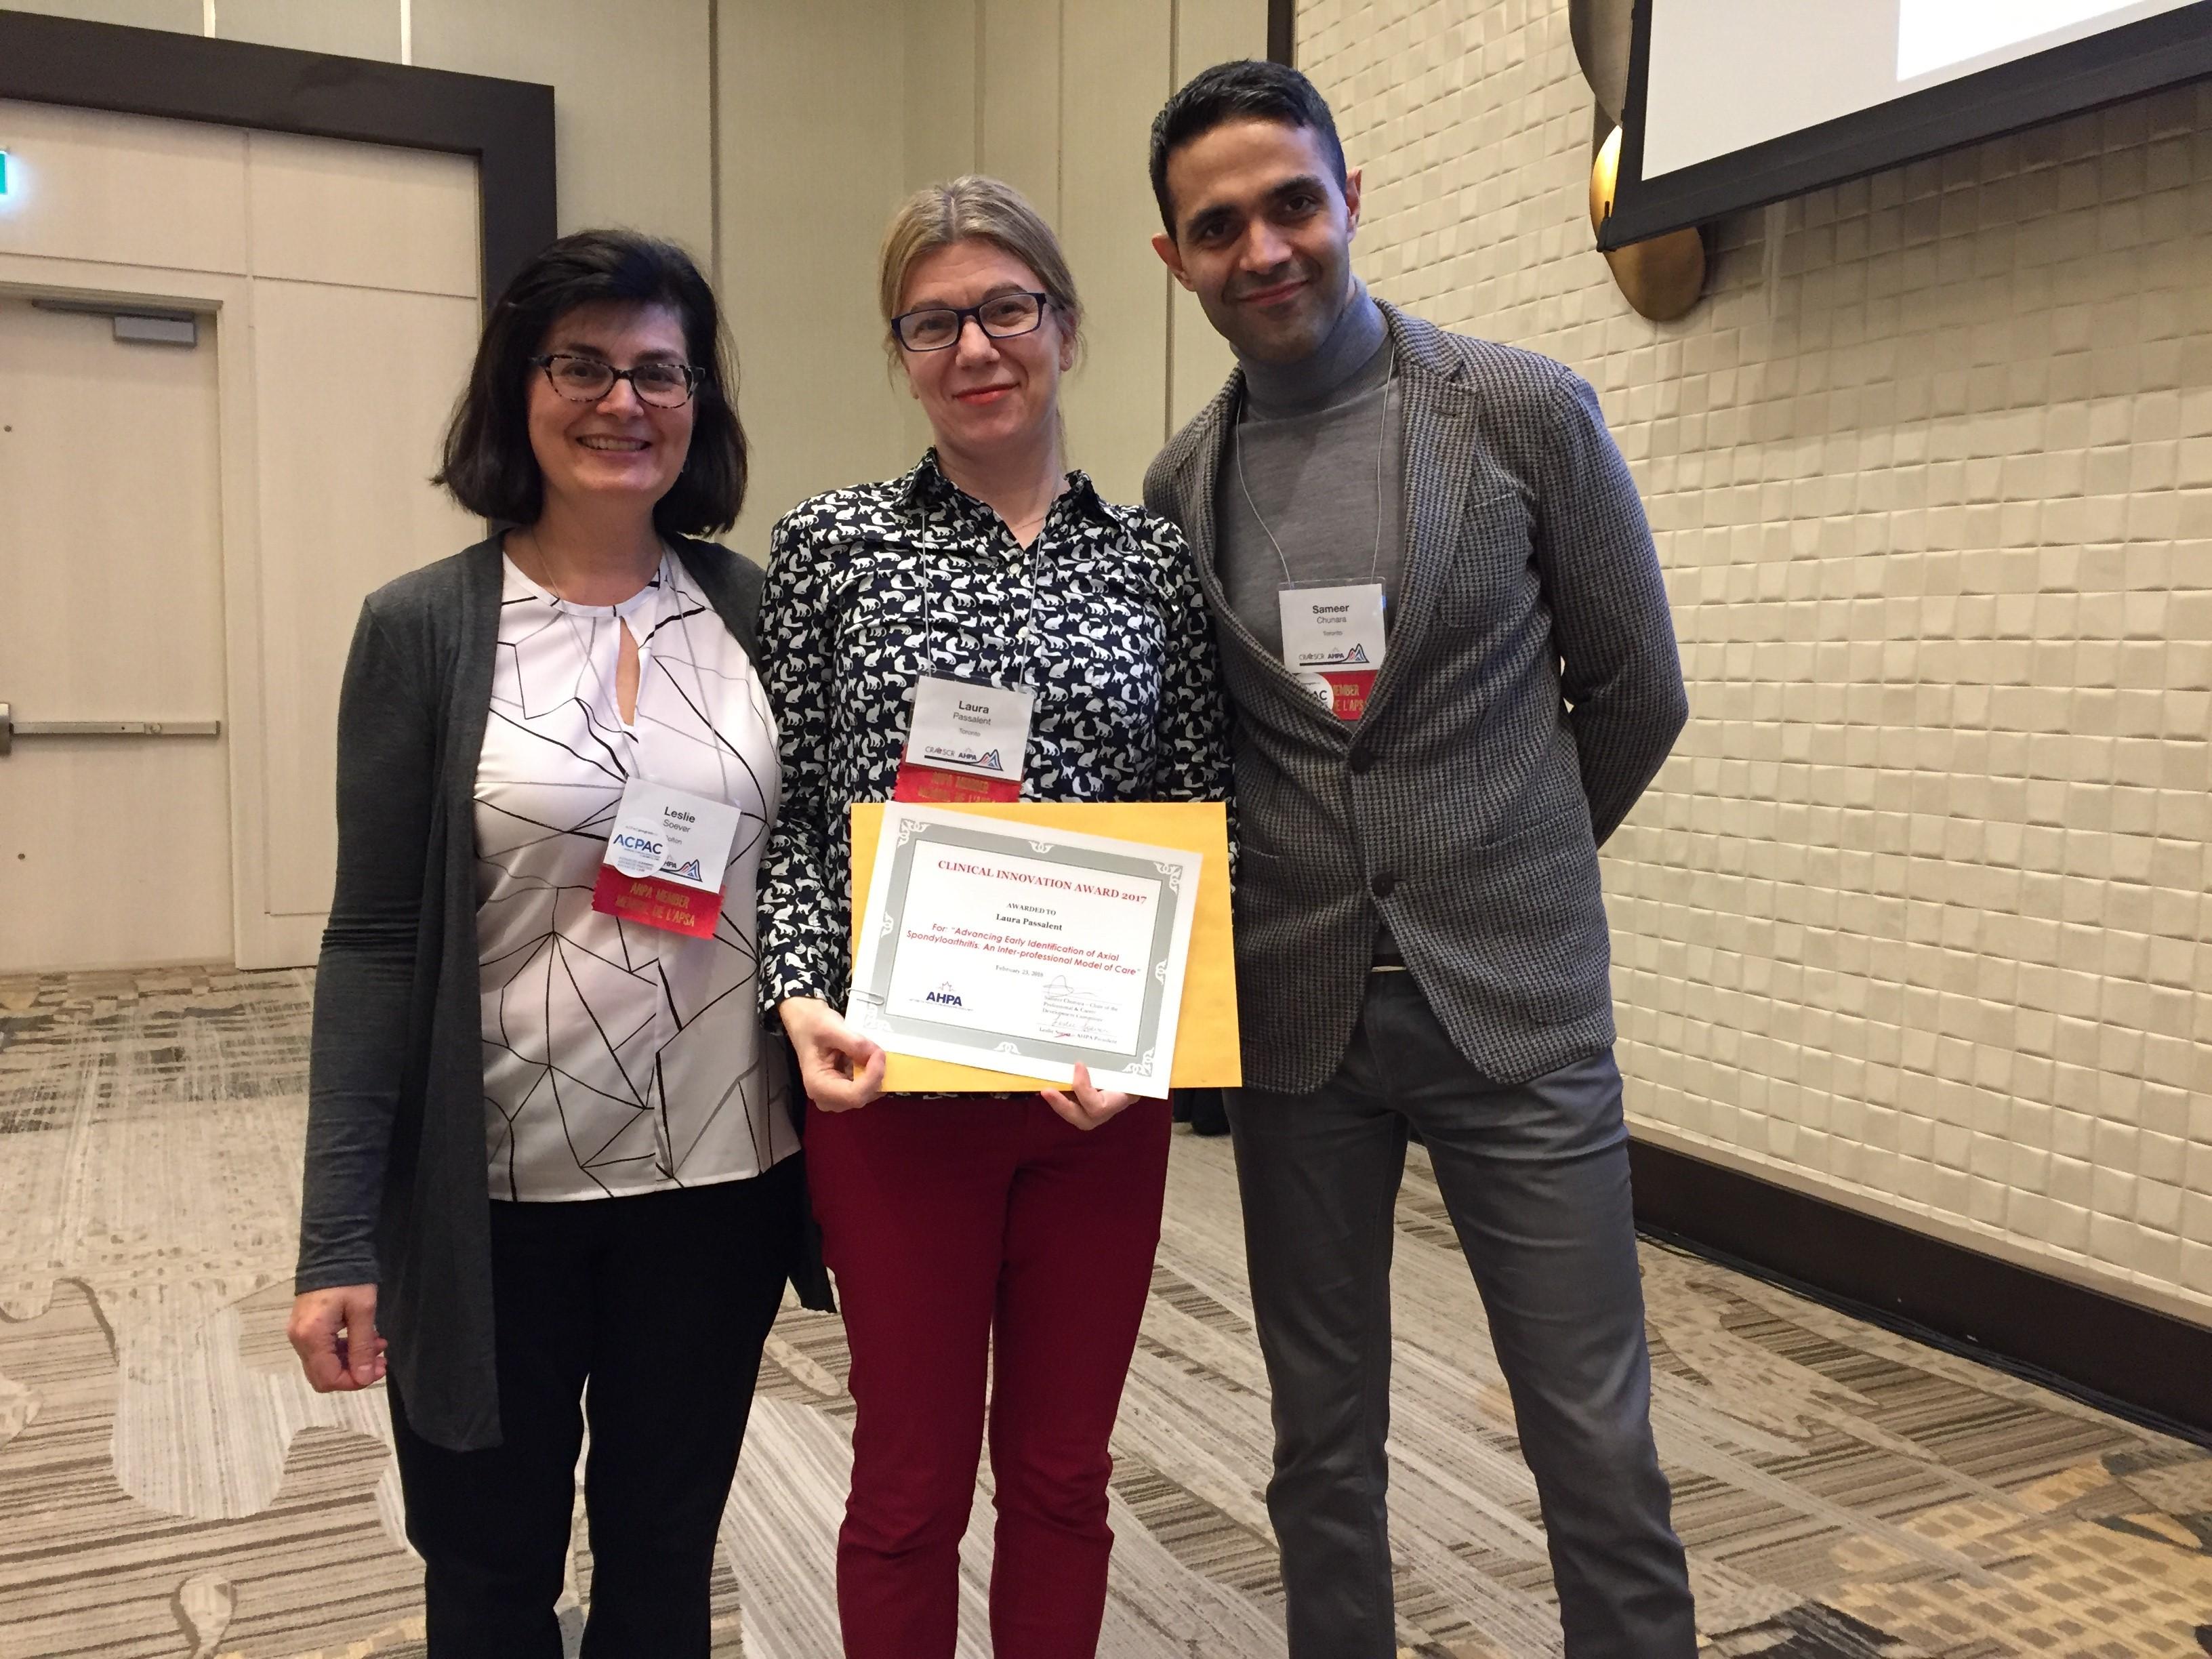 Laura_Passalant_Clinical_Innovation_Award